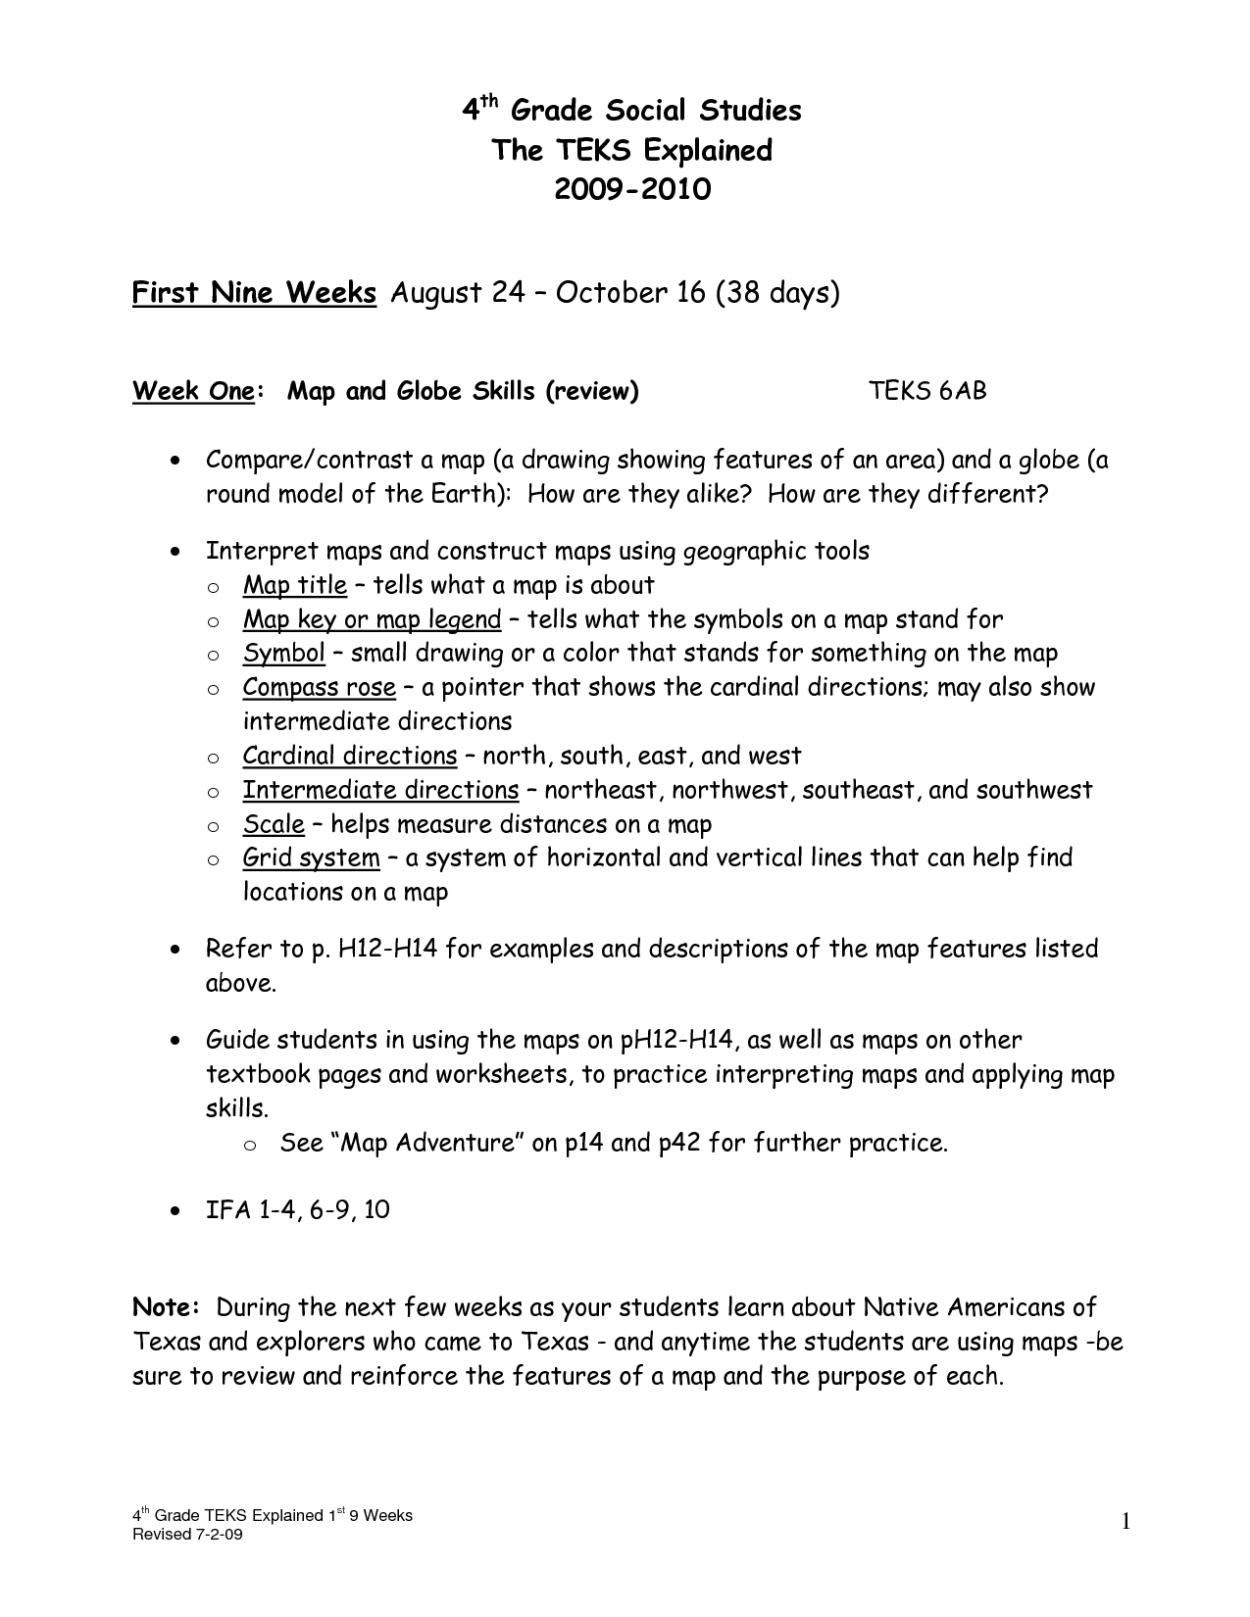 4th Grade Worksheets Printable